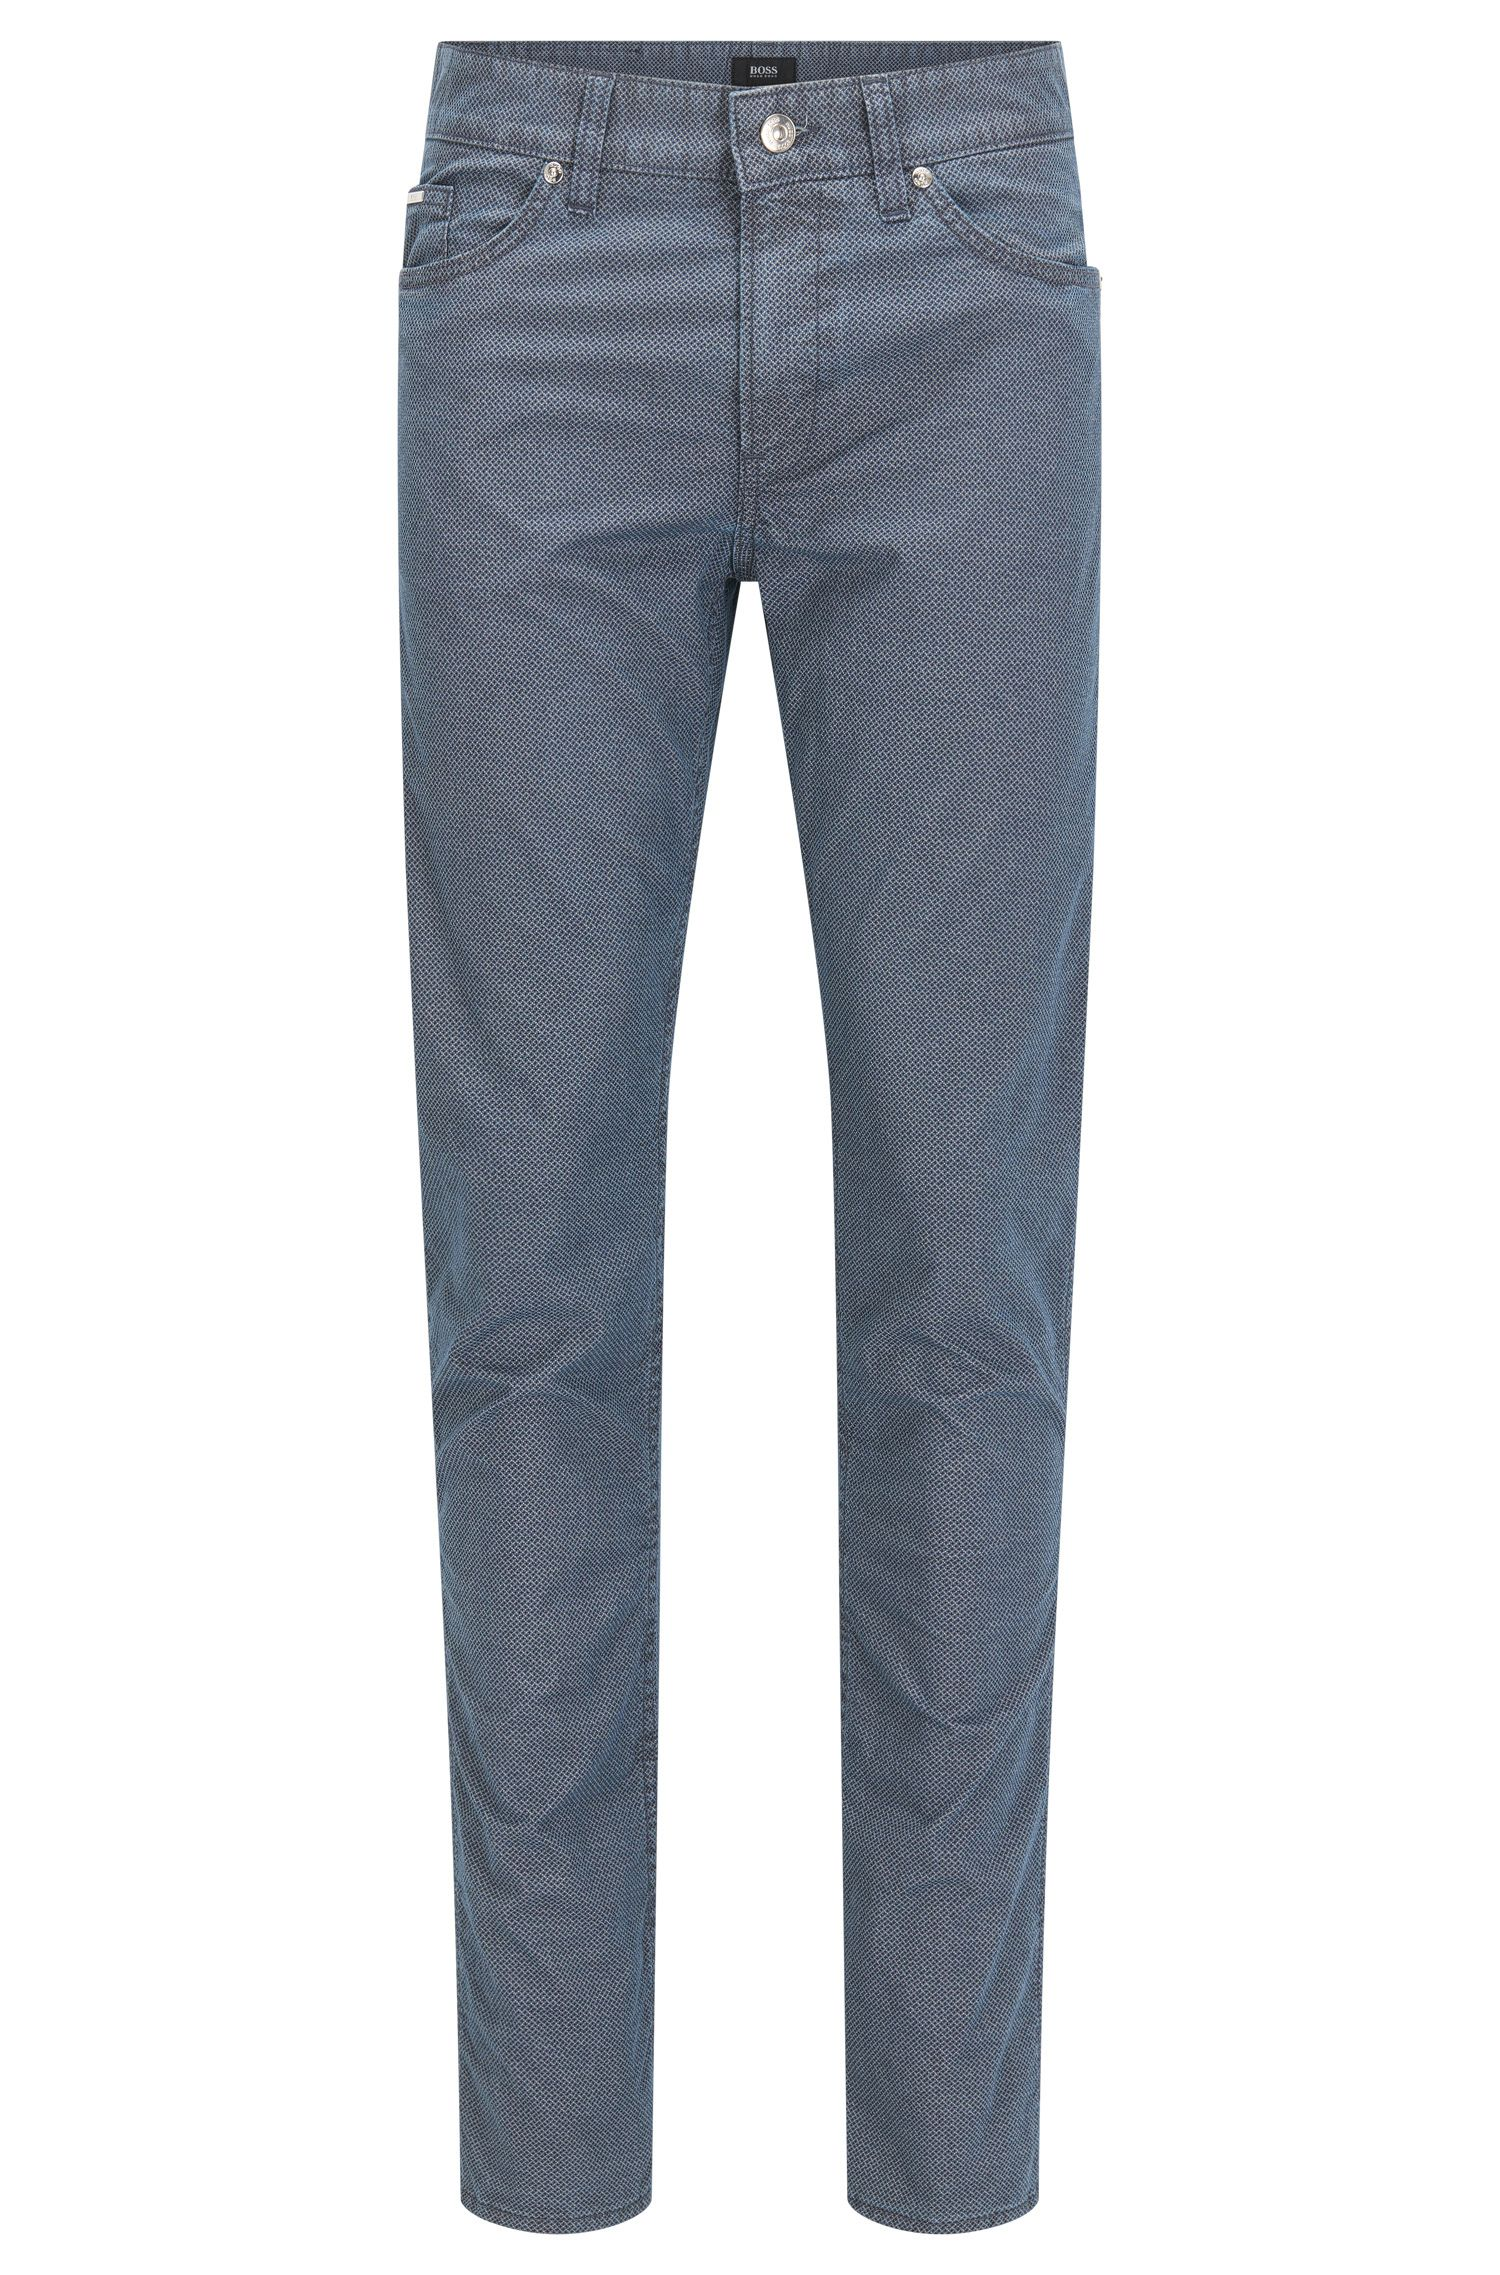 Geometric Stretch Cotton Jean, Slim Fit | Delaware